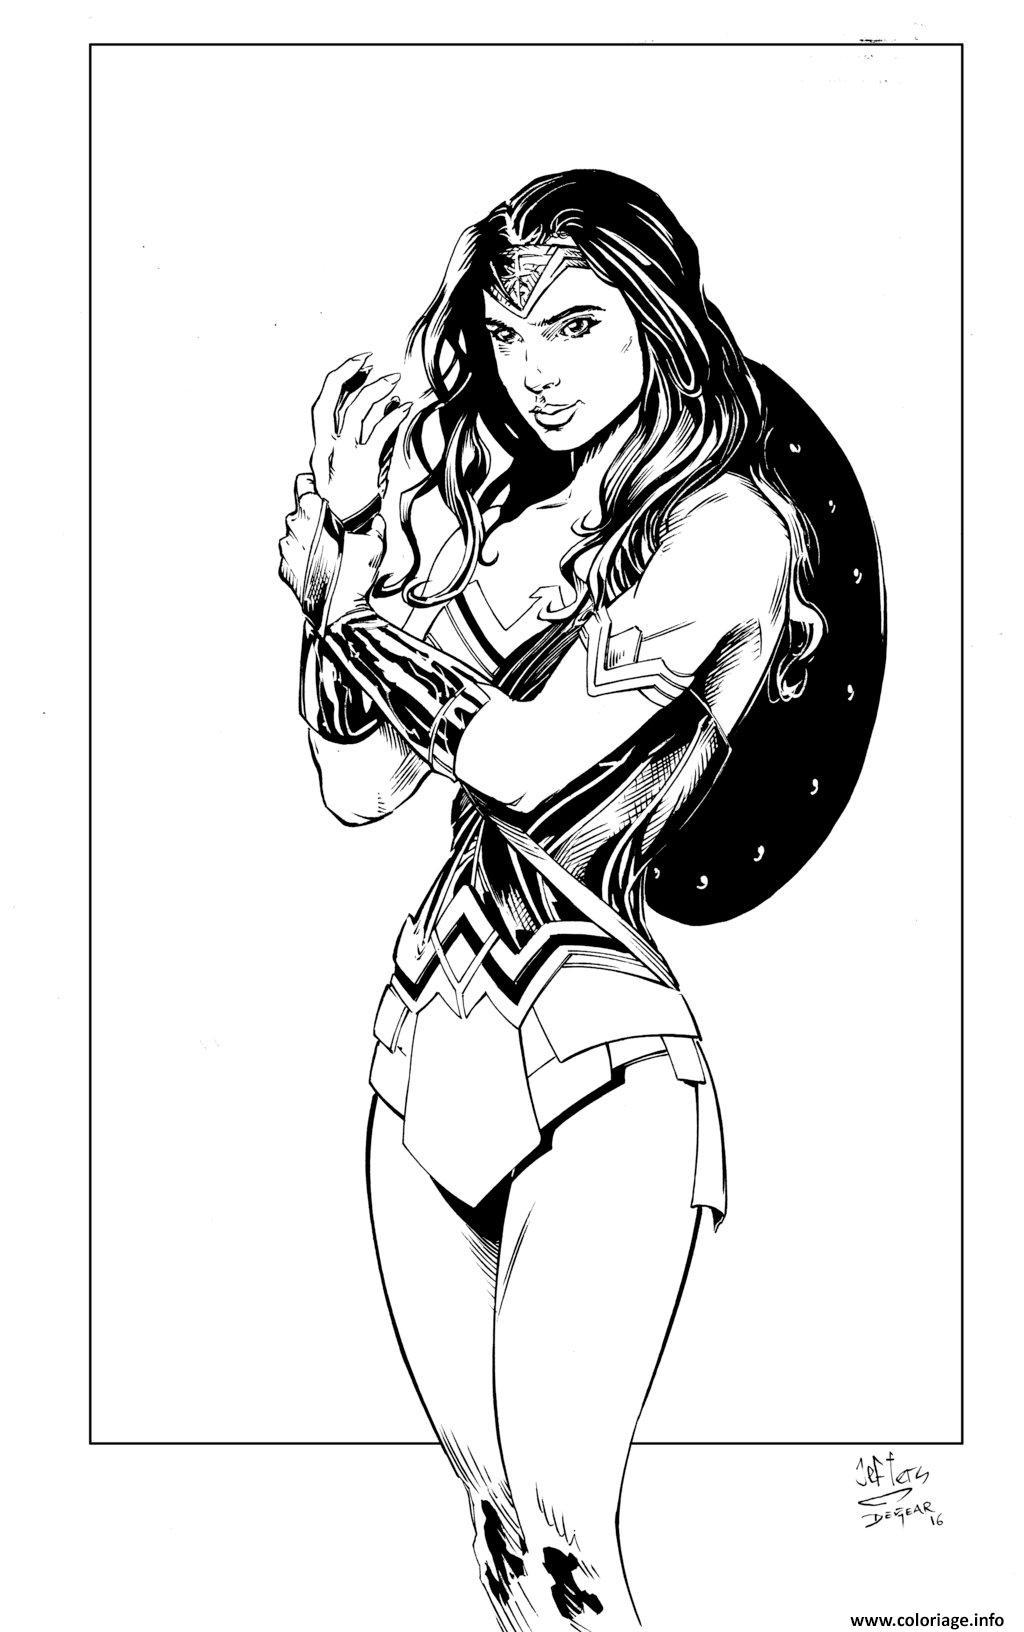 Coloriage Wonder Woman Inks By Devgear Dessin